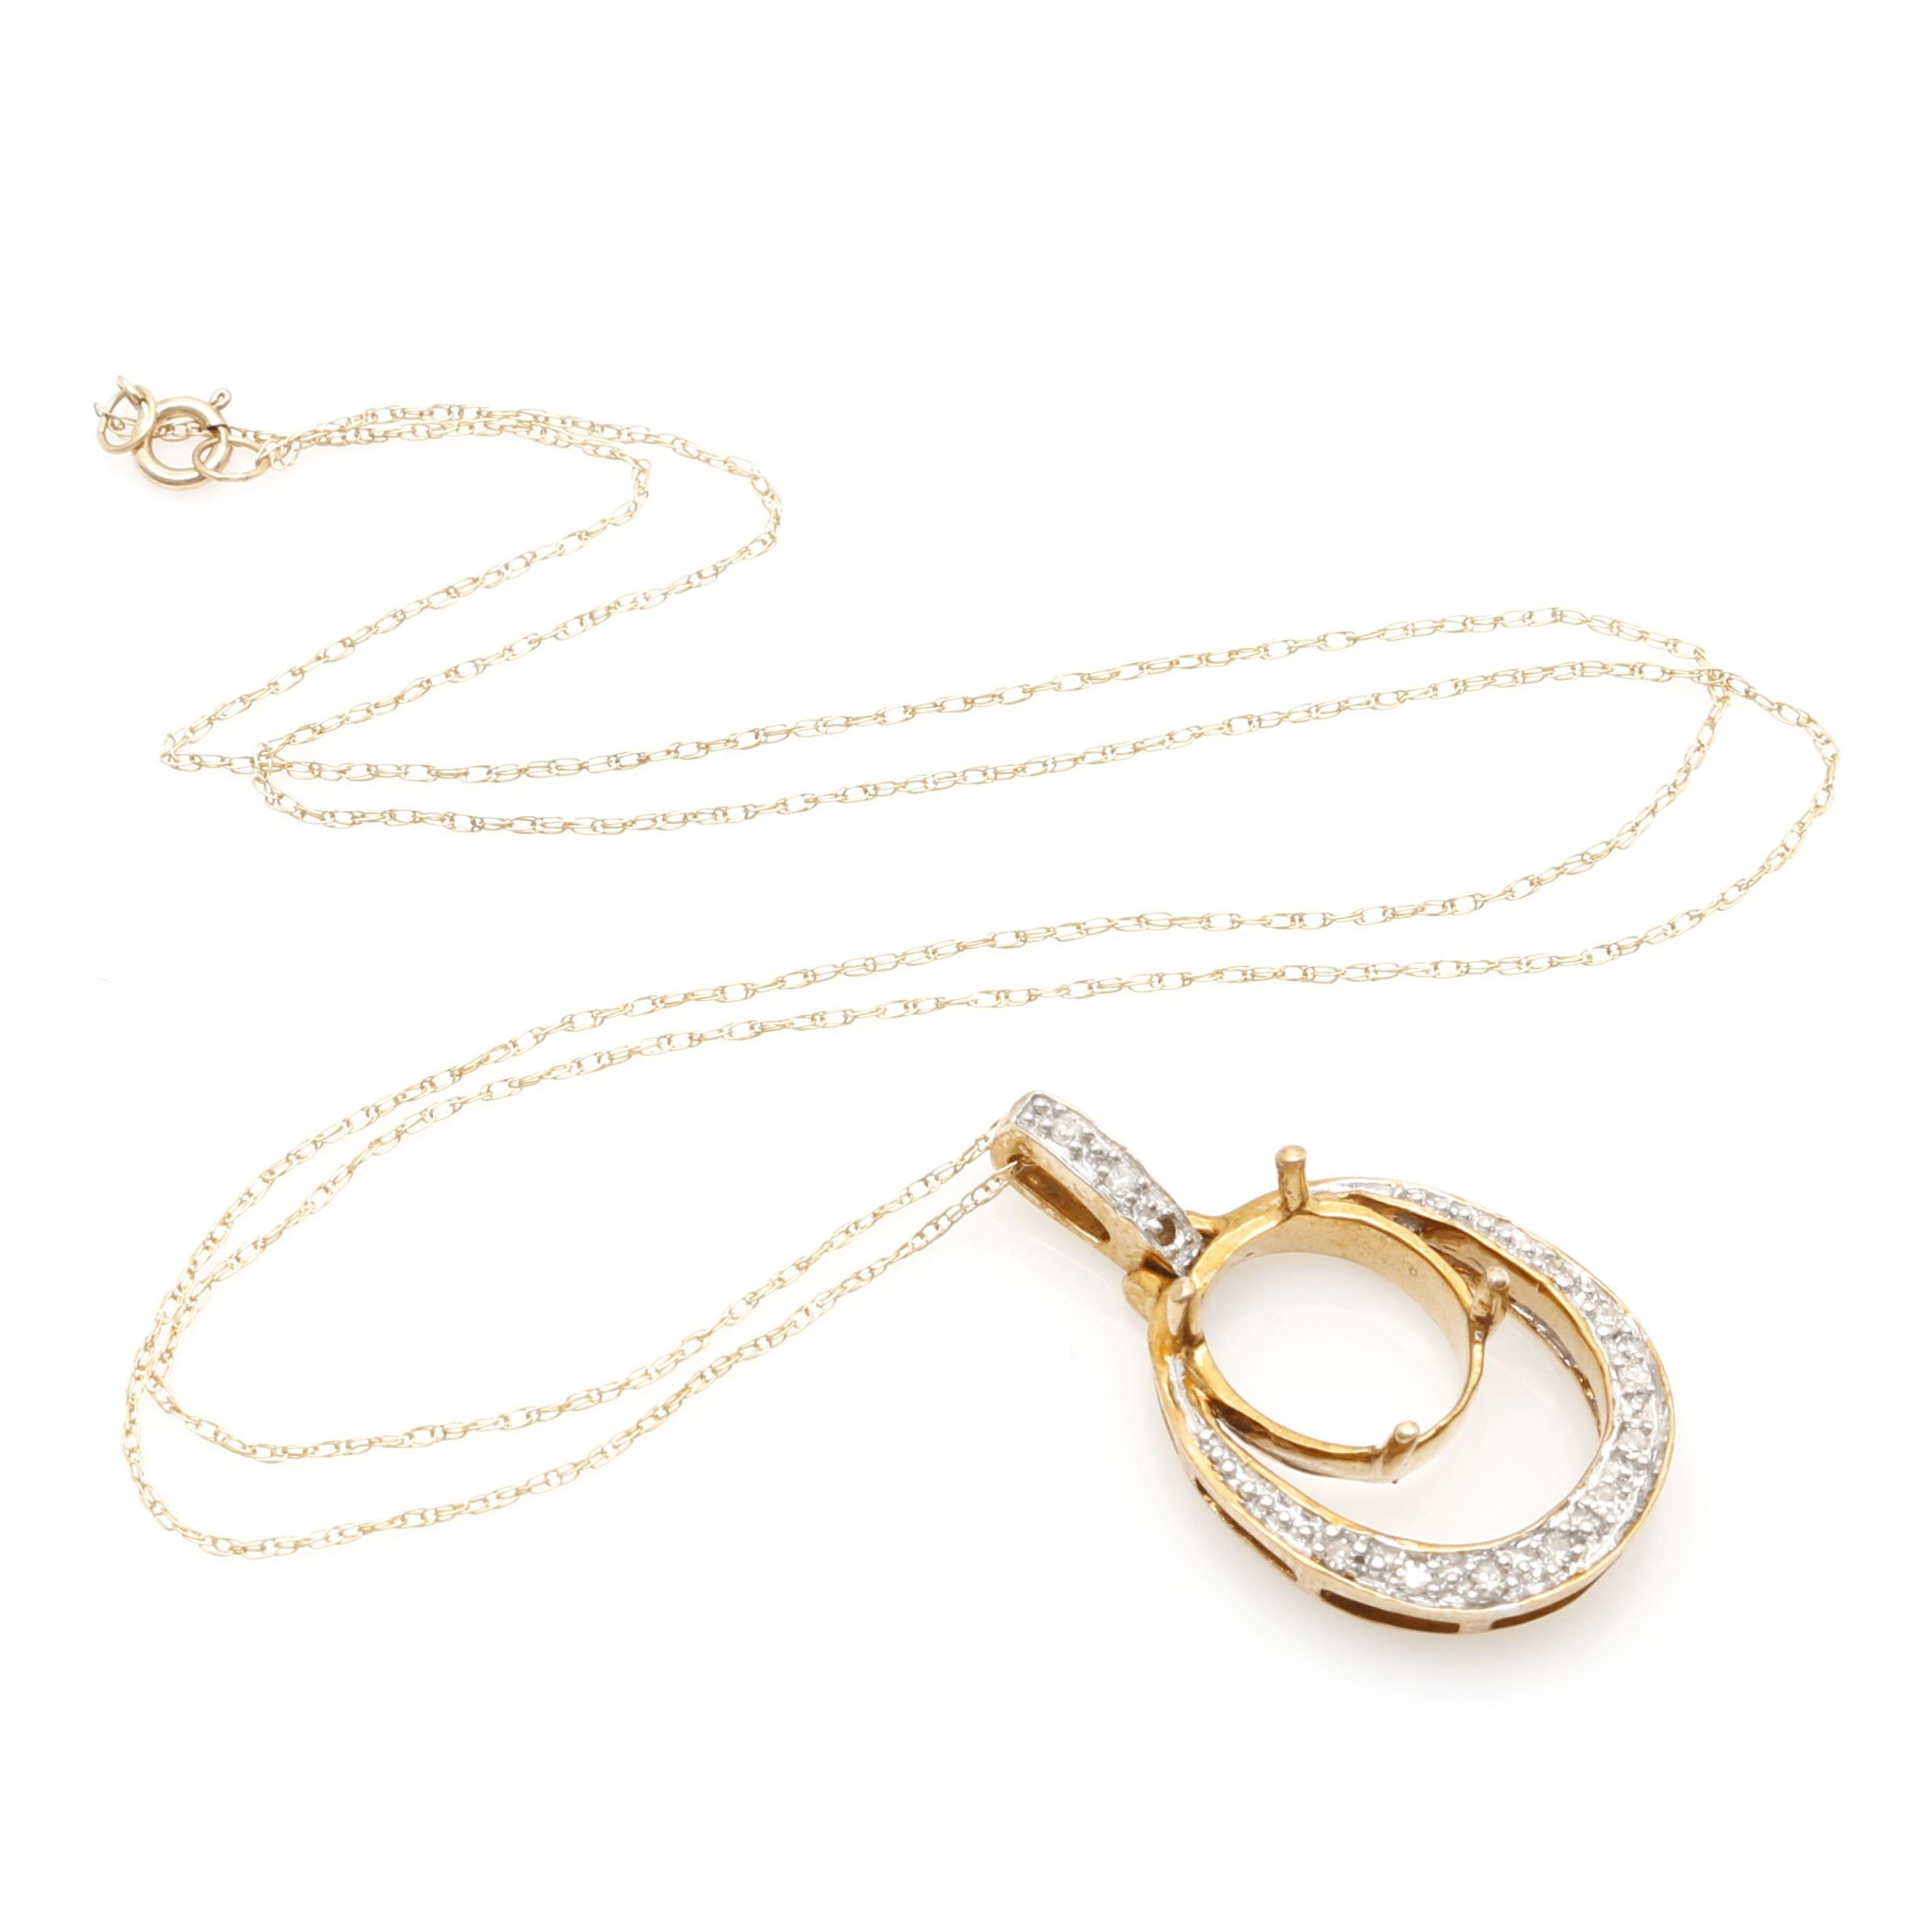 10K Yellow Gold Diamond Semi-Mount Pendant Necklace.